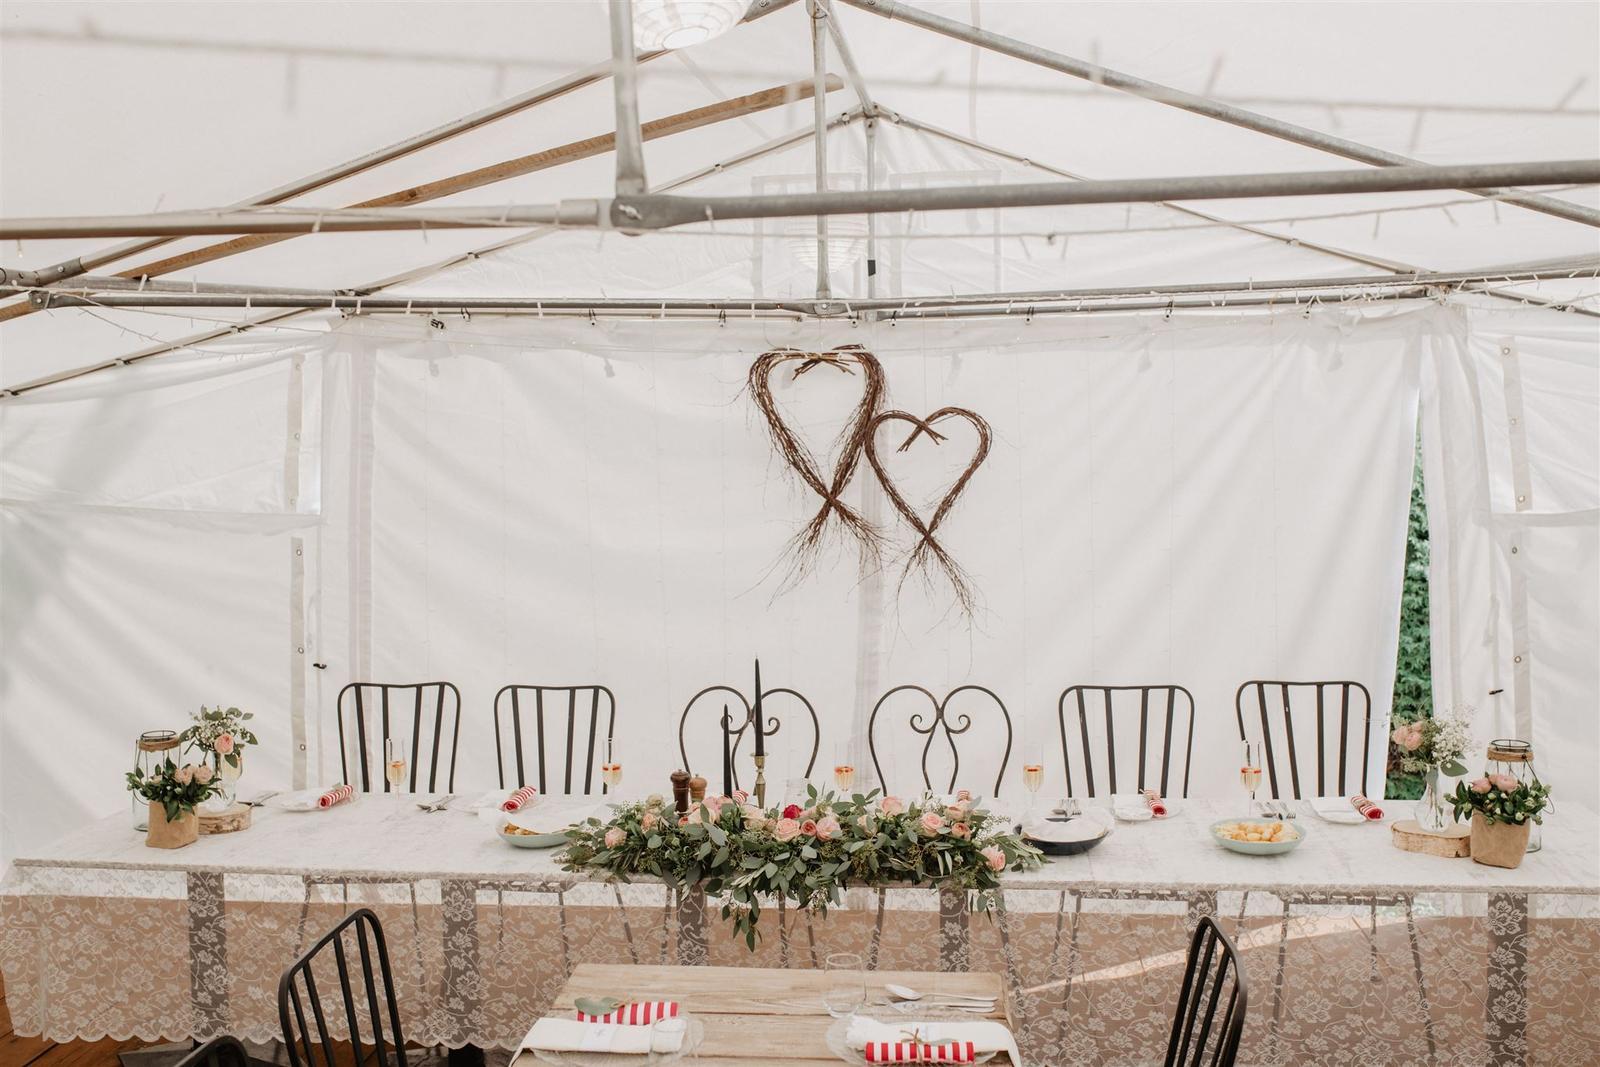 Krásna a romantická svadobná party v záhrade reštaurácie Bistra Dukát - Le Gout v srdci B. Bystrice. - Obrázok č. 5